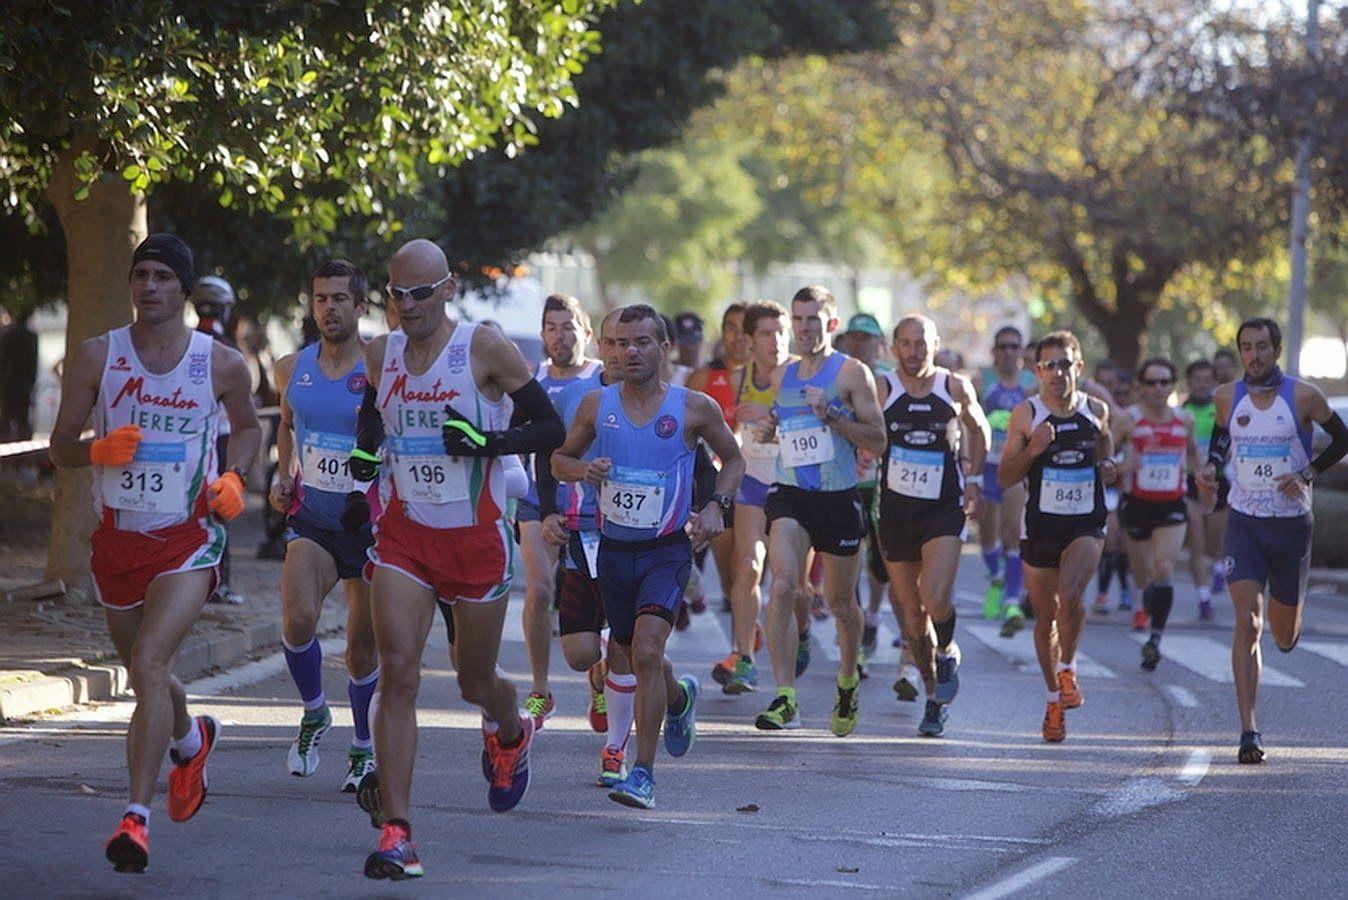 media-maraton-jerez (20)--1348x900